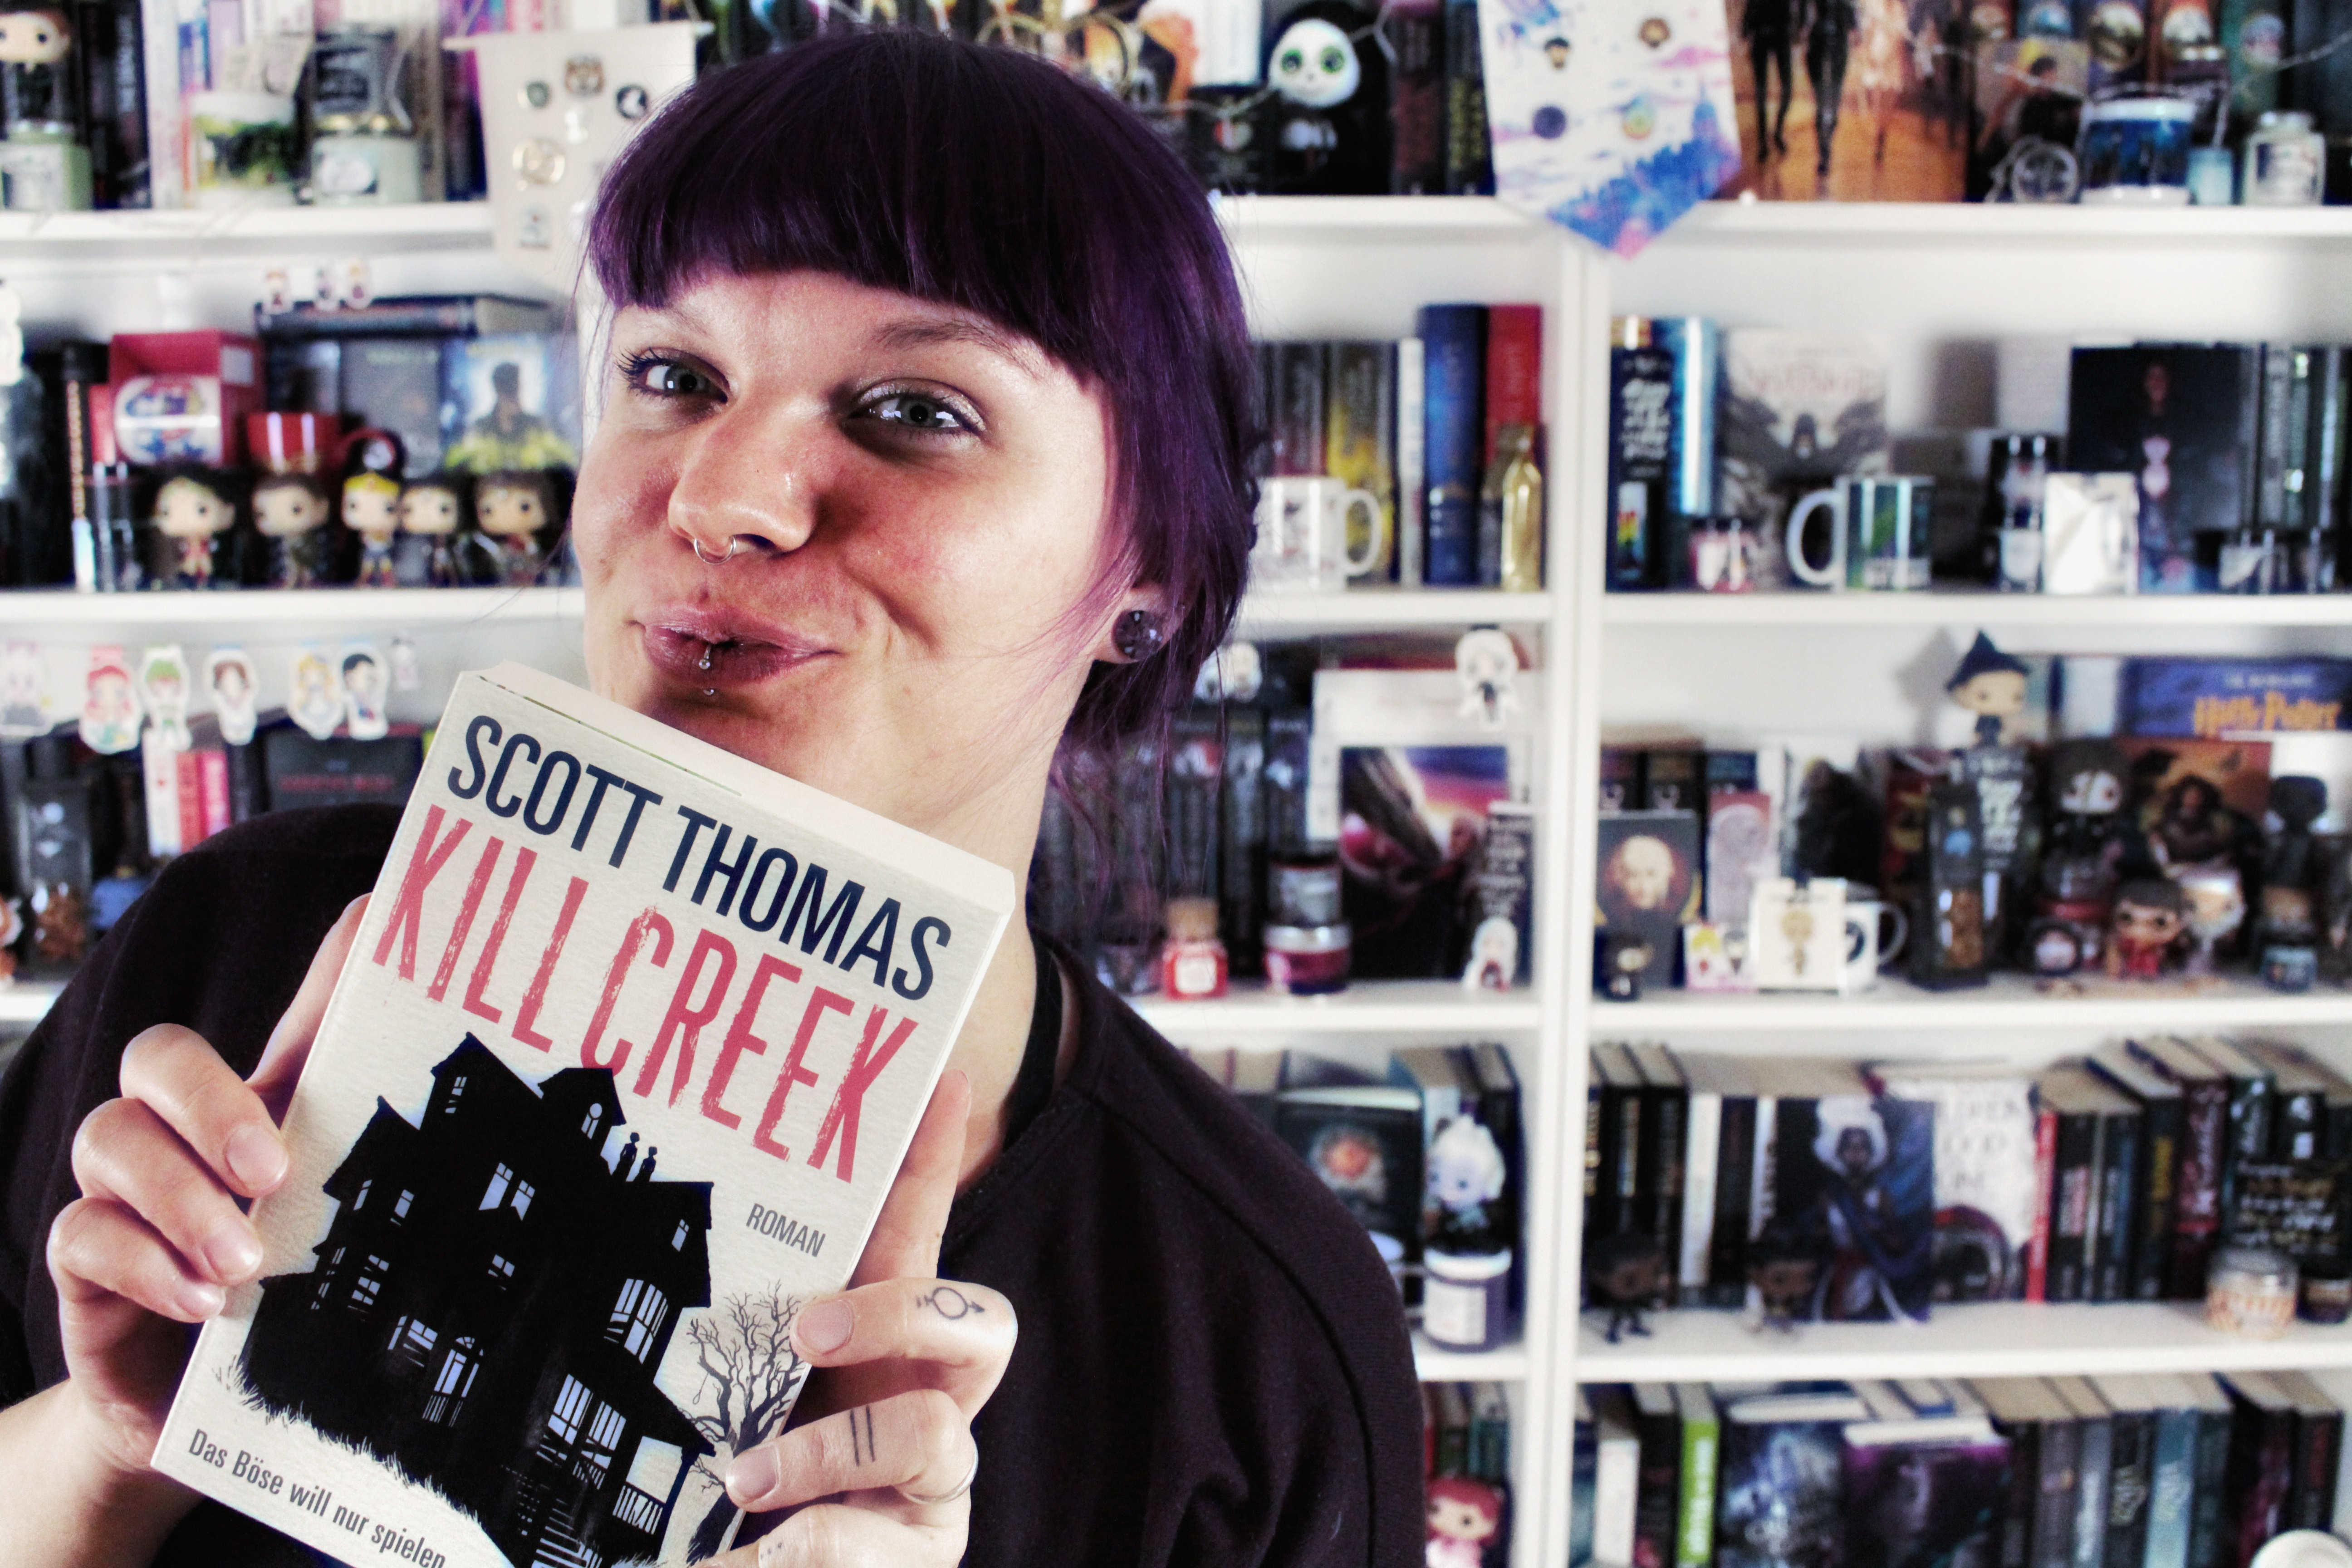 Rezension | Kill Creek von Scott Thomas